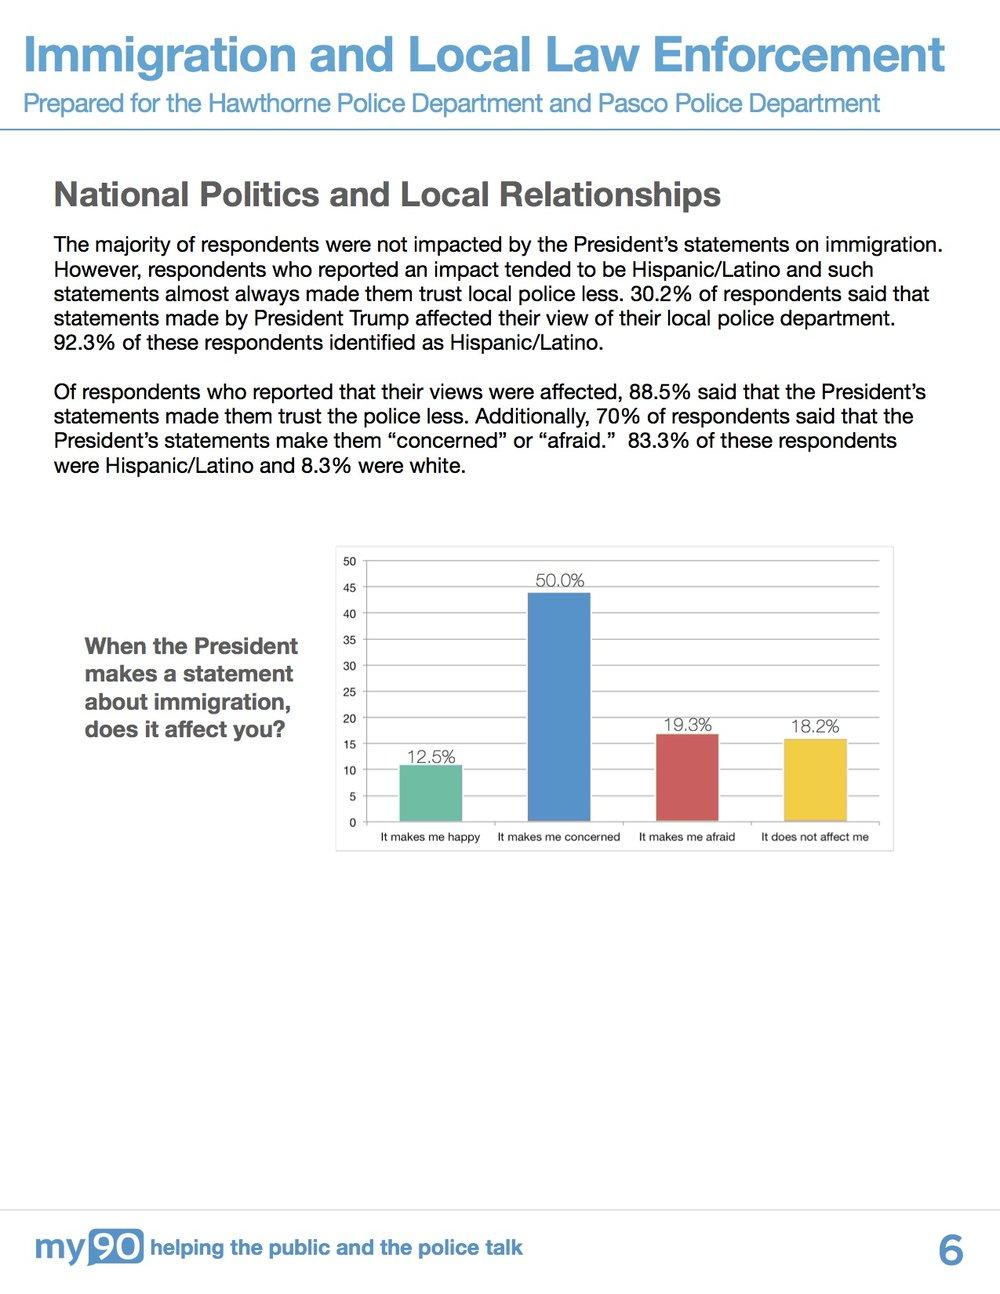 Immigration Report 6.jpg